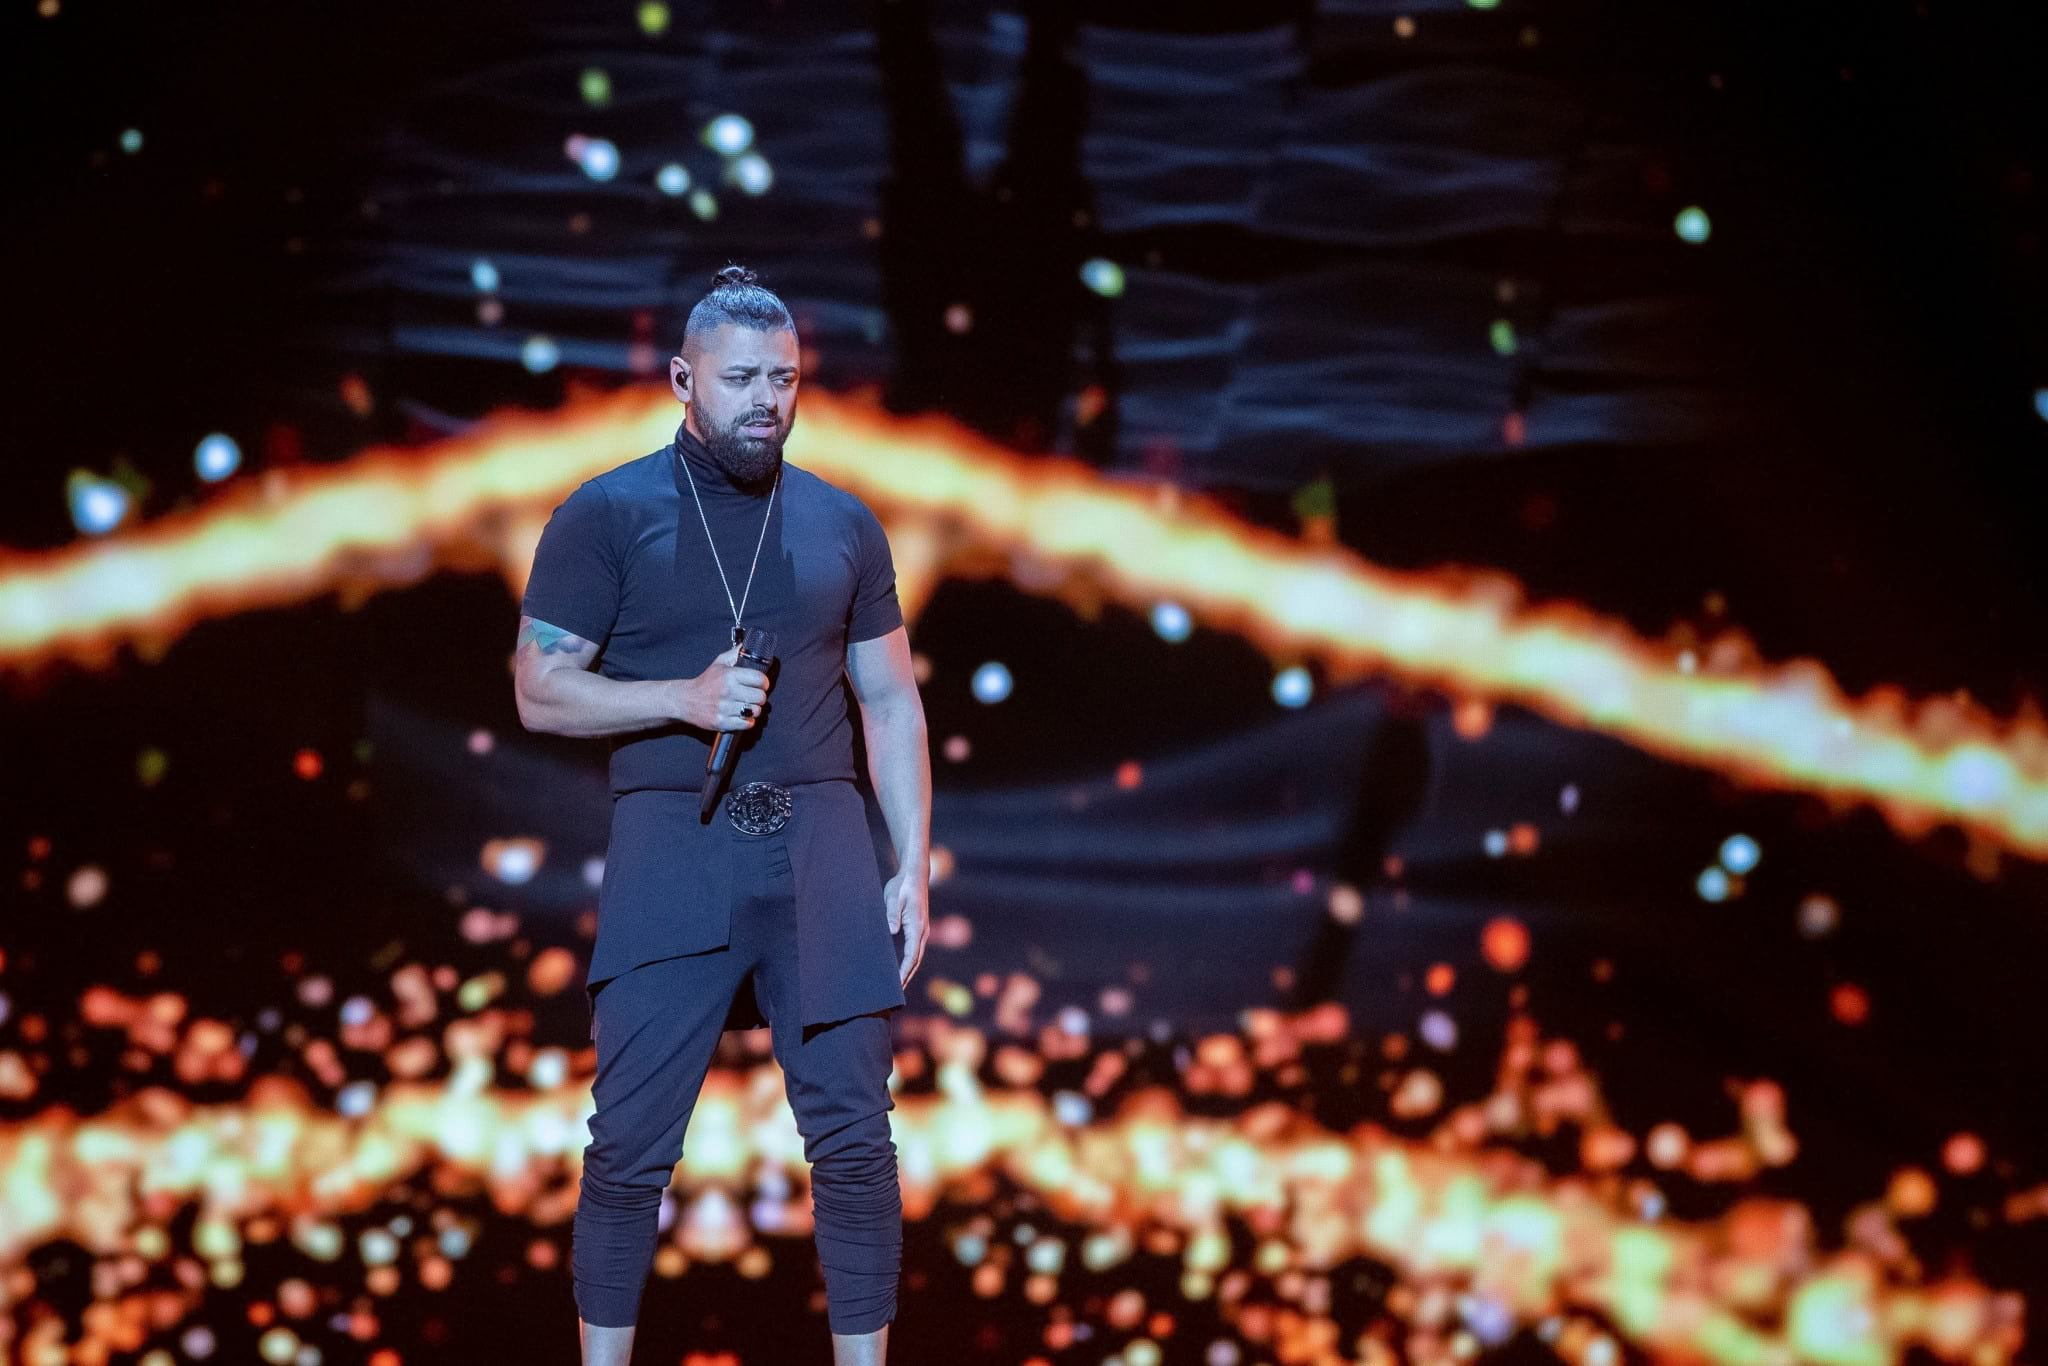 Hungary: Returning act Joci Pápai makes his first rehearsal